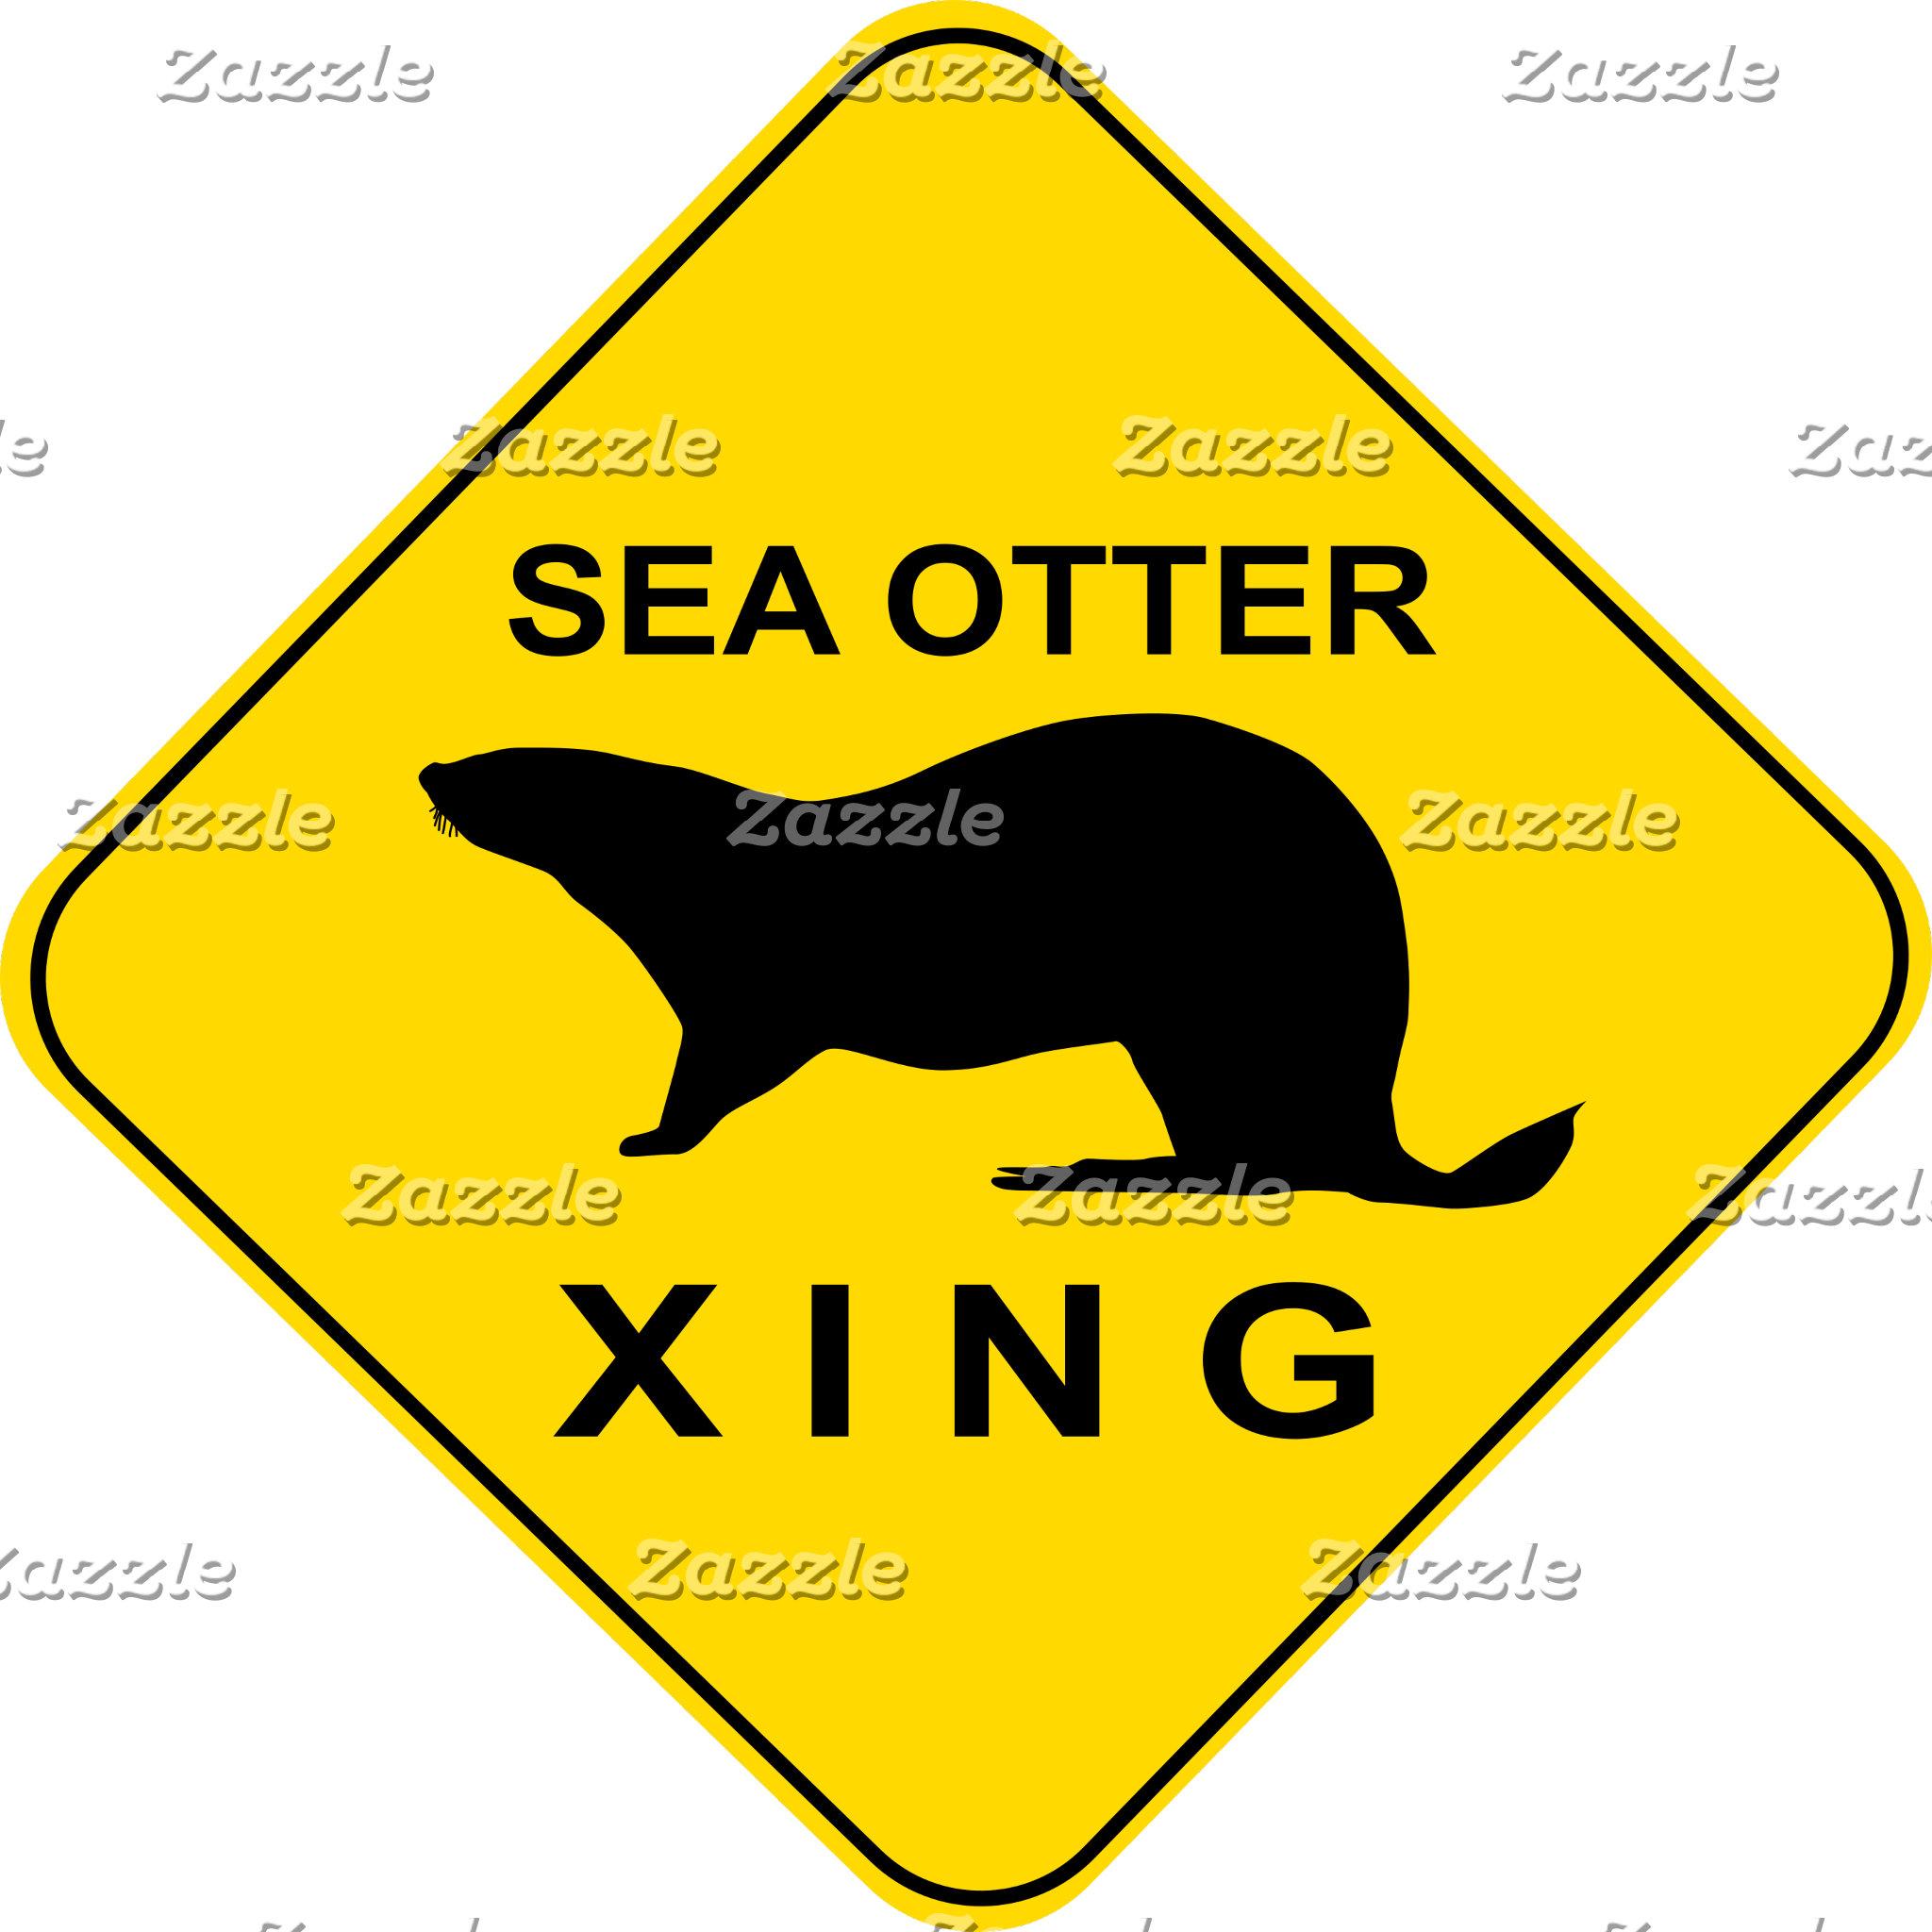 Sea Otter Xing